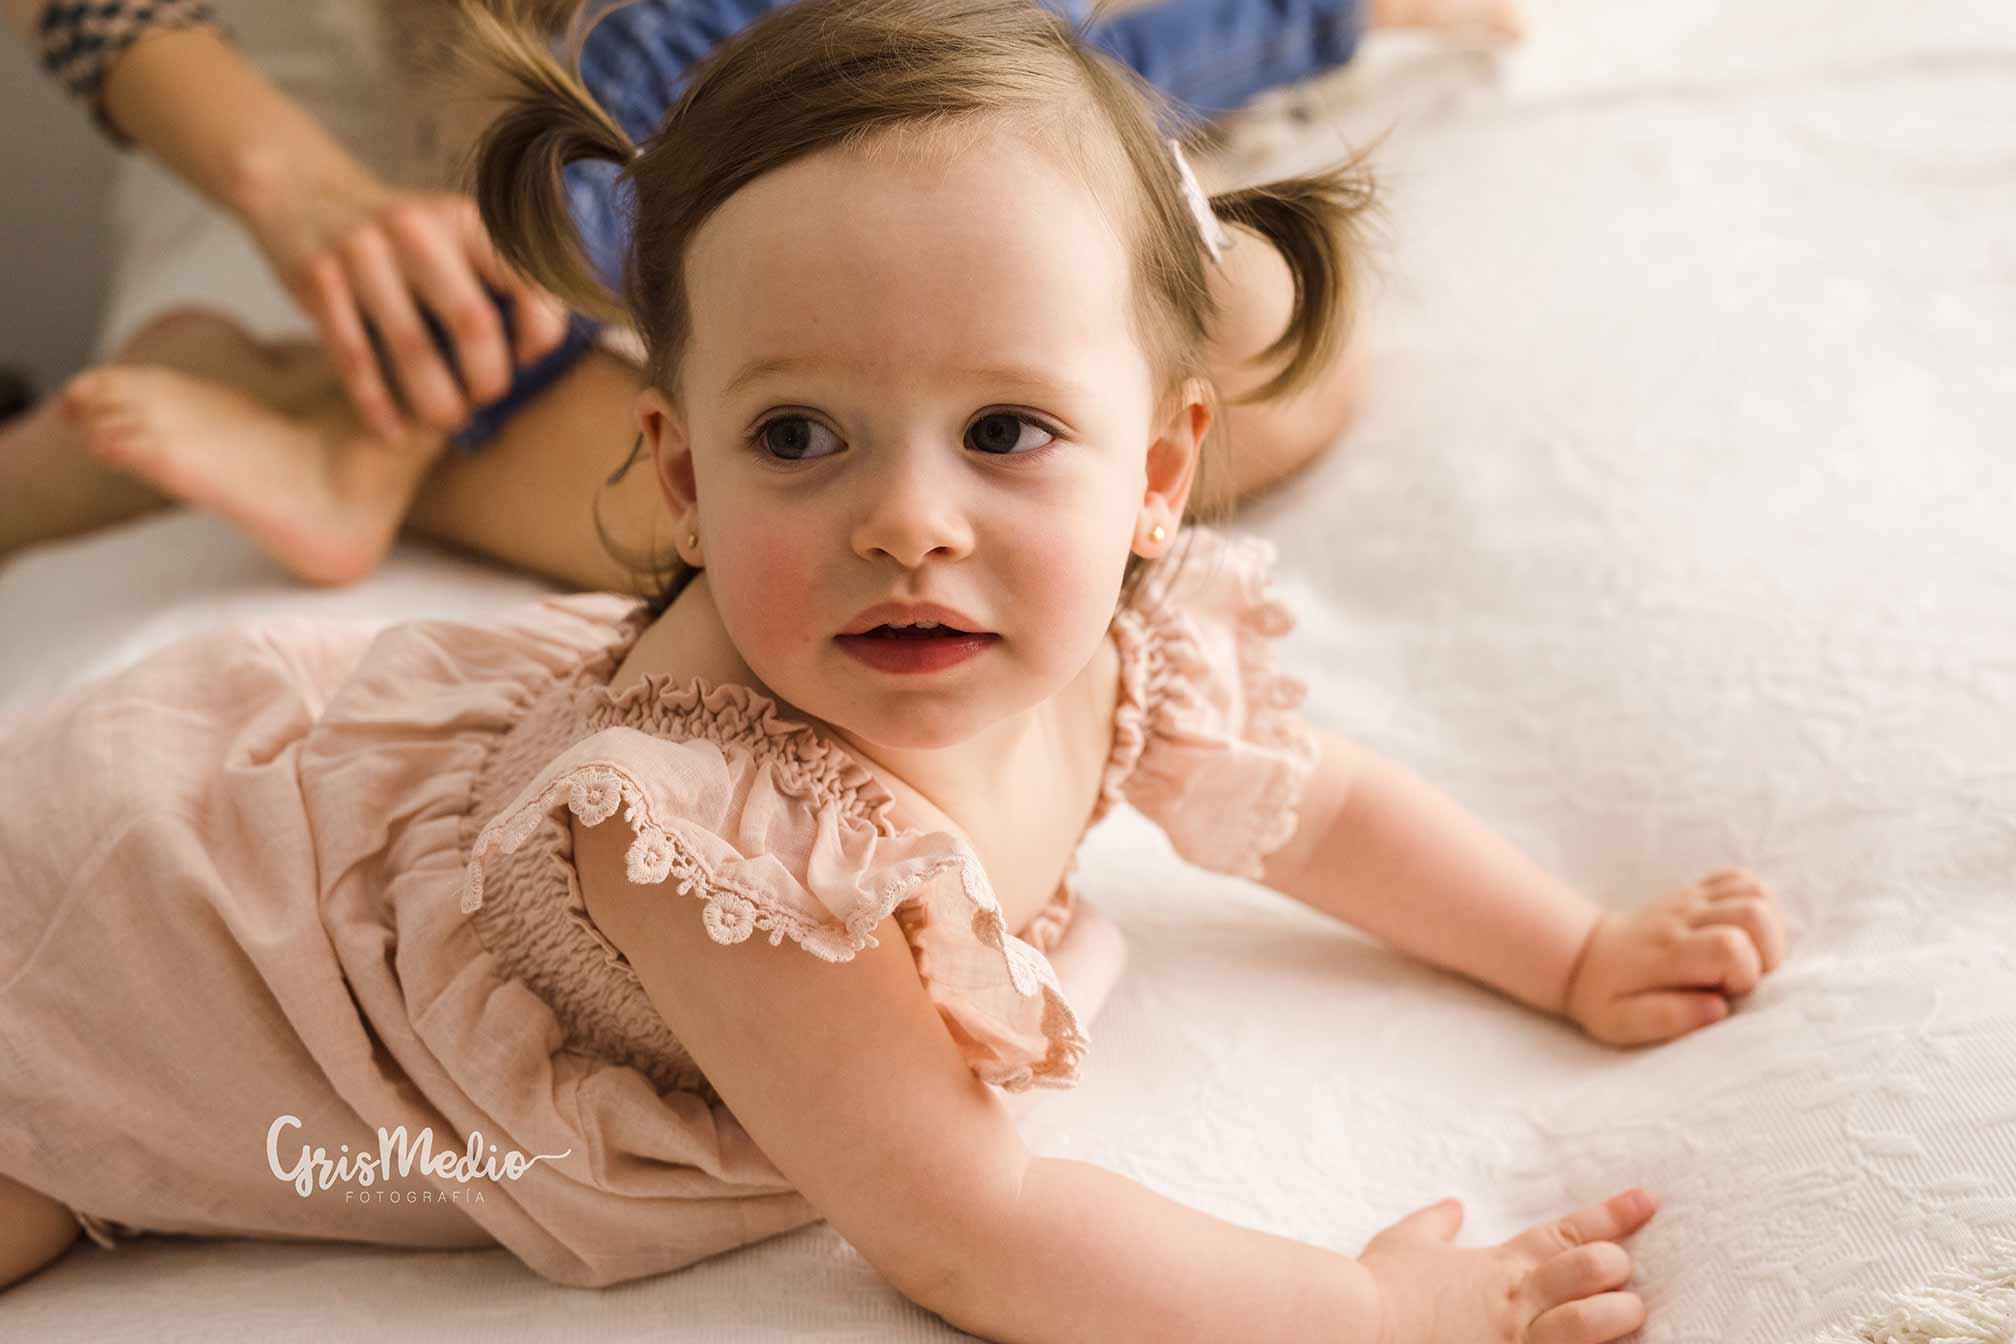 fotografia-familia-infantil-zaragoza-grismedio-bebe-lactancia14